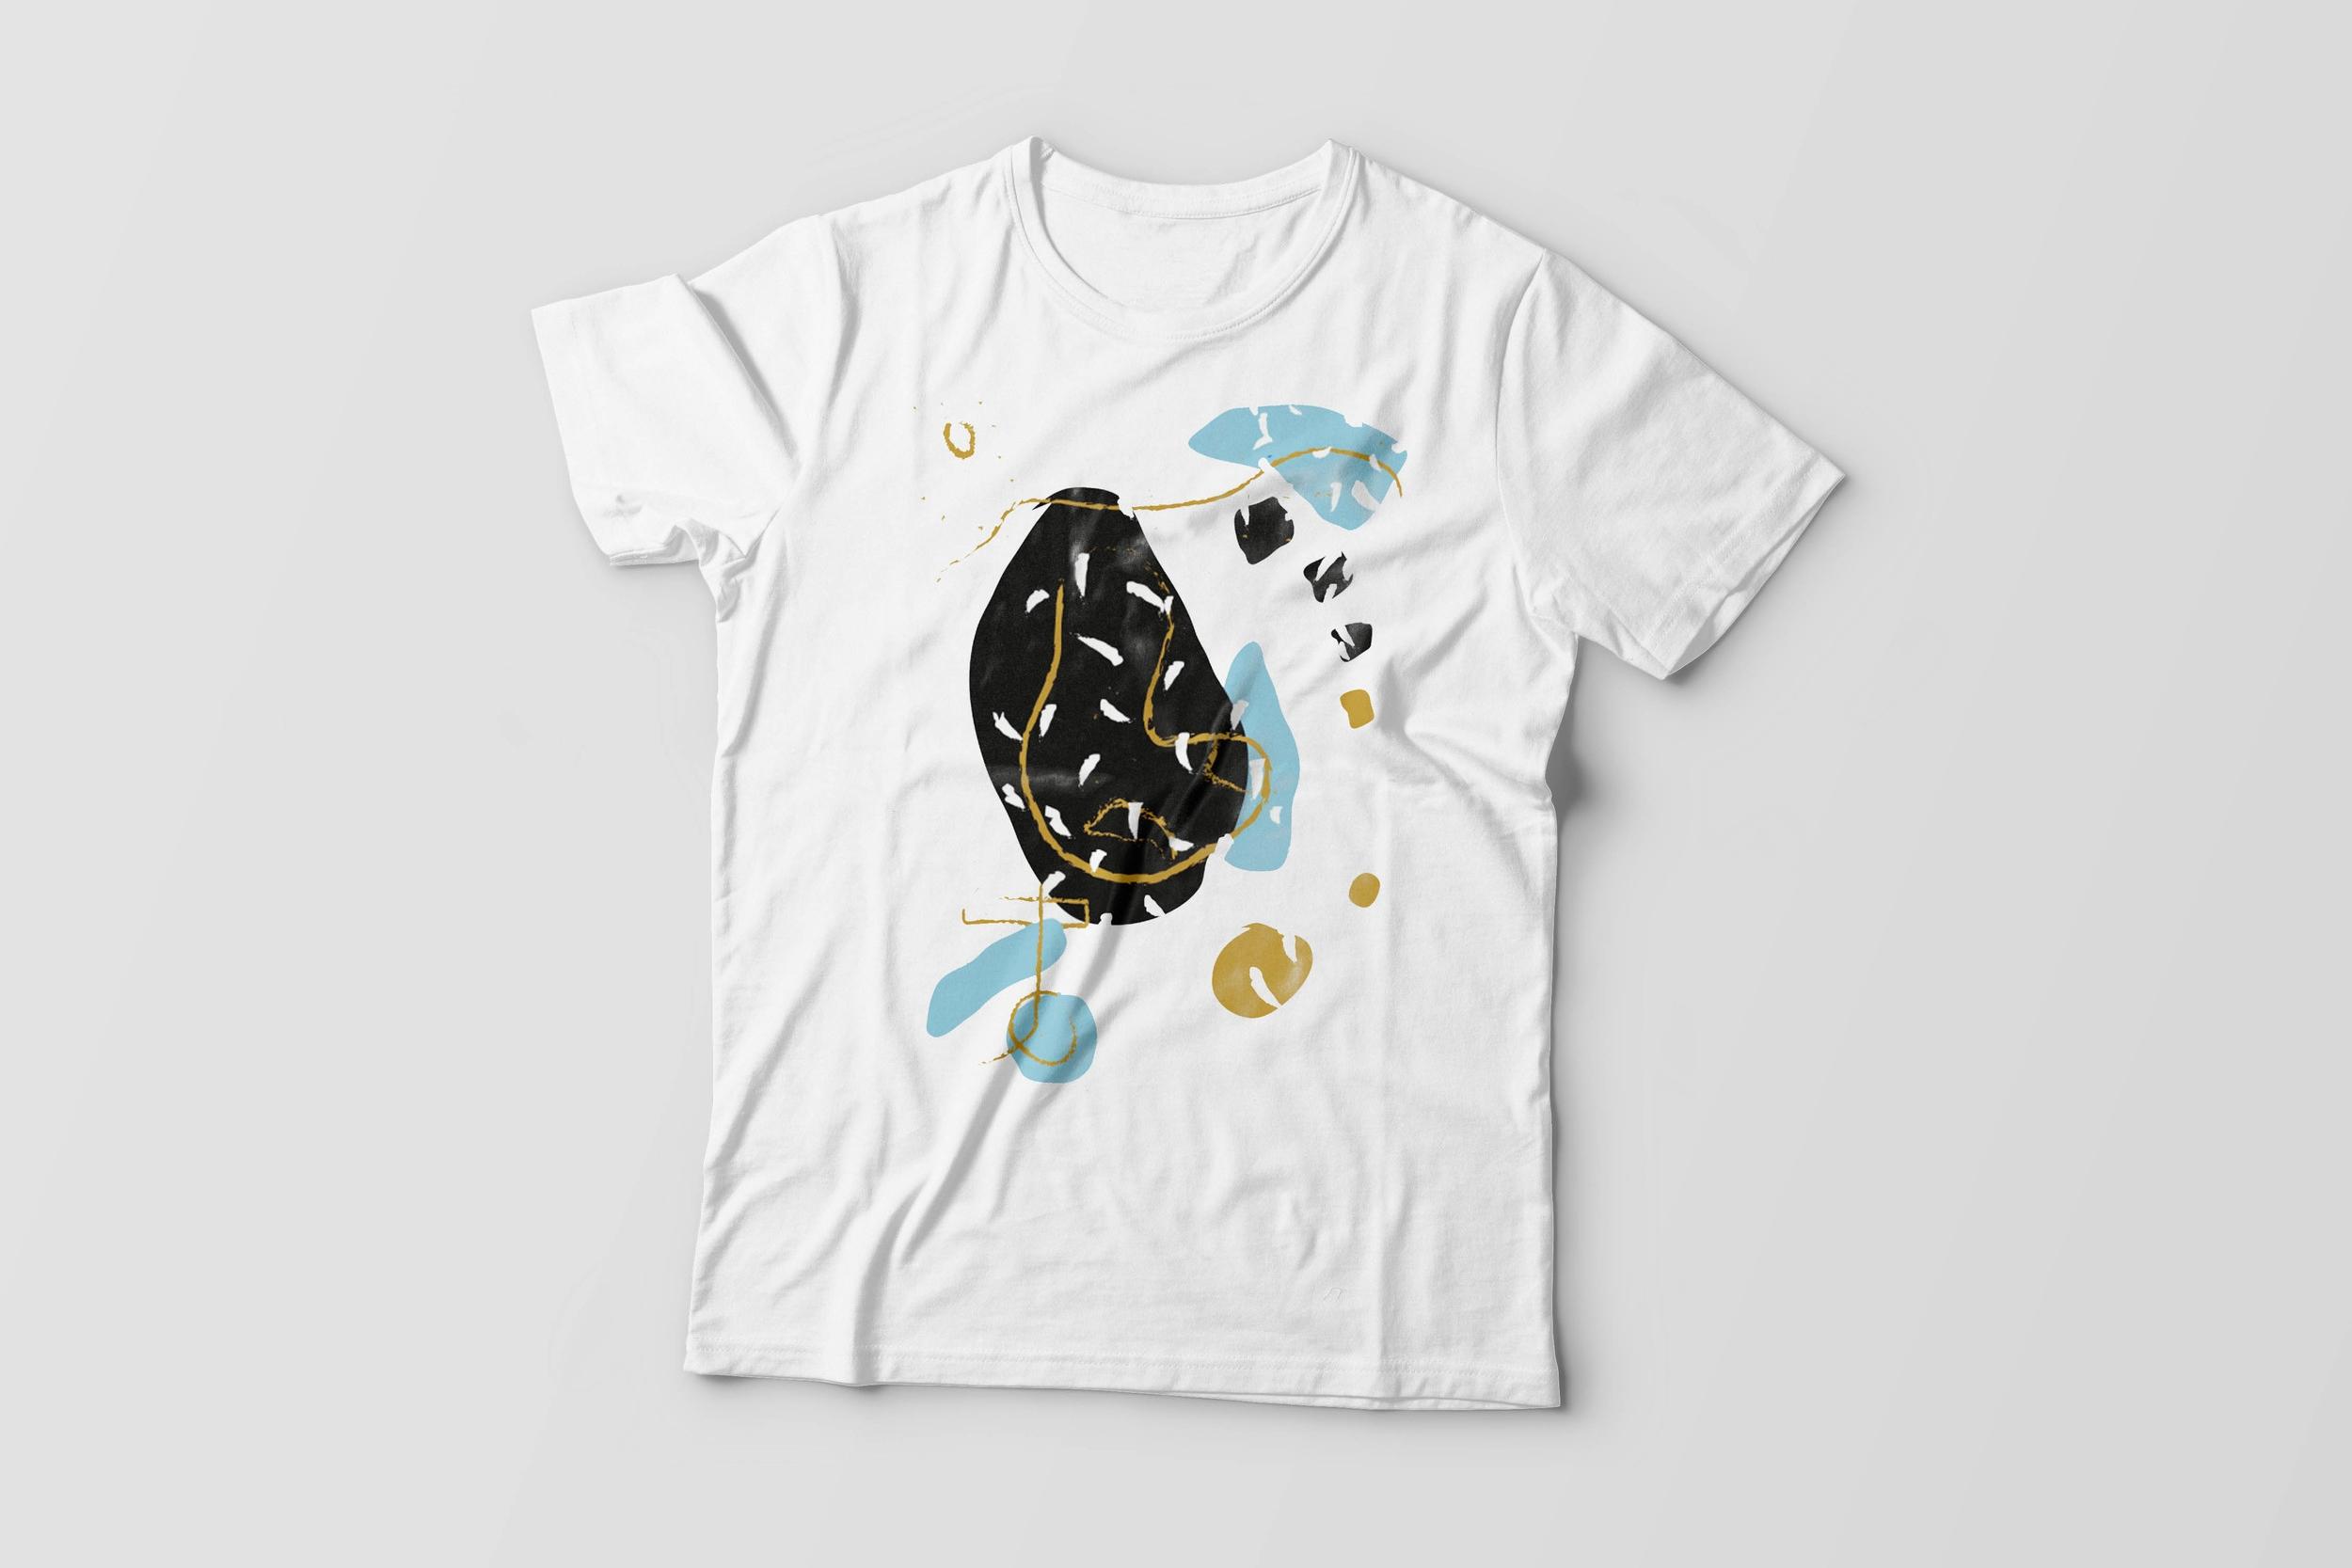 T-Shirt-Mockup-vol3 2.jpg